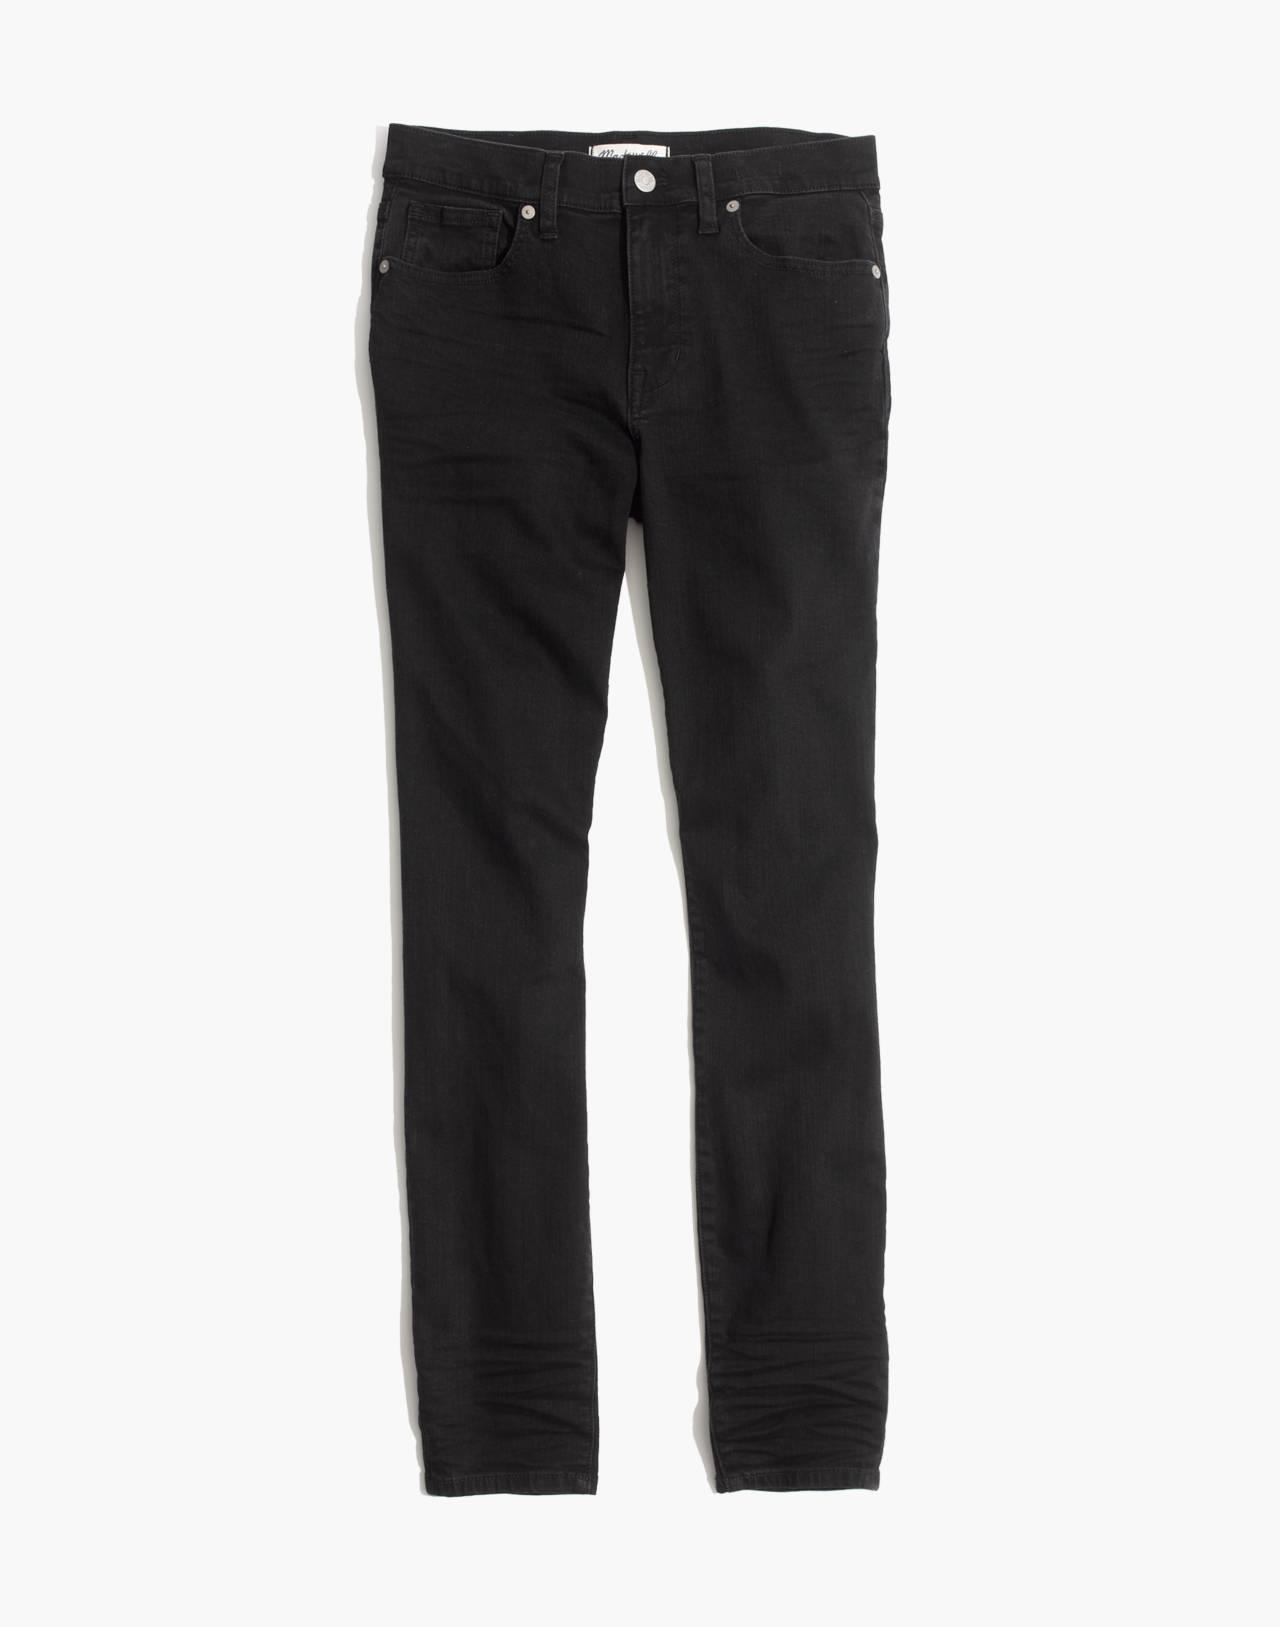 "Petite 9"" High-Rise Skinny Jeans in Lunar in lunar wash image 4"